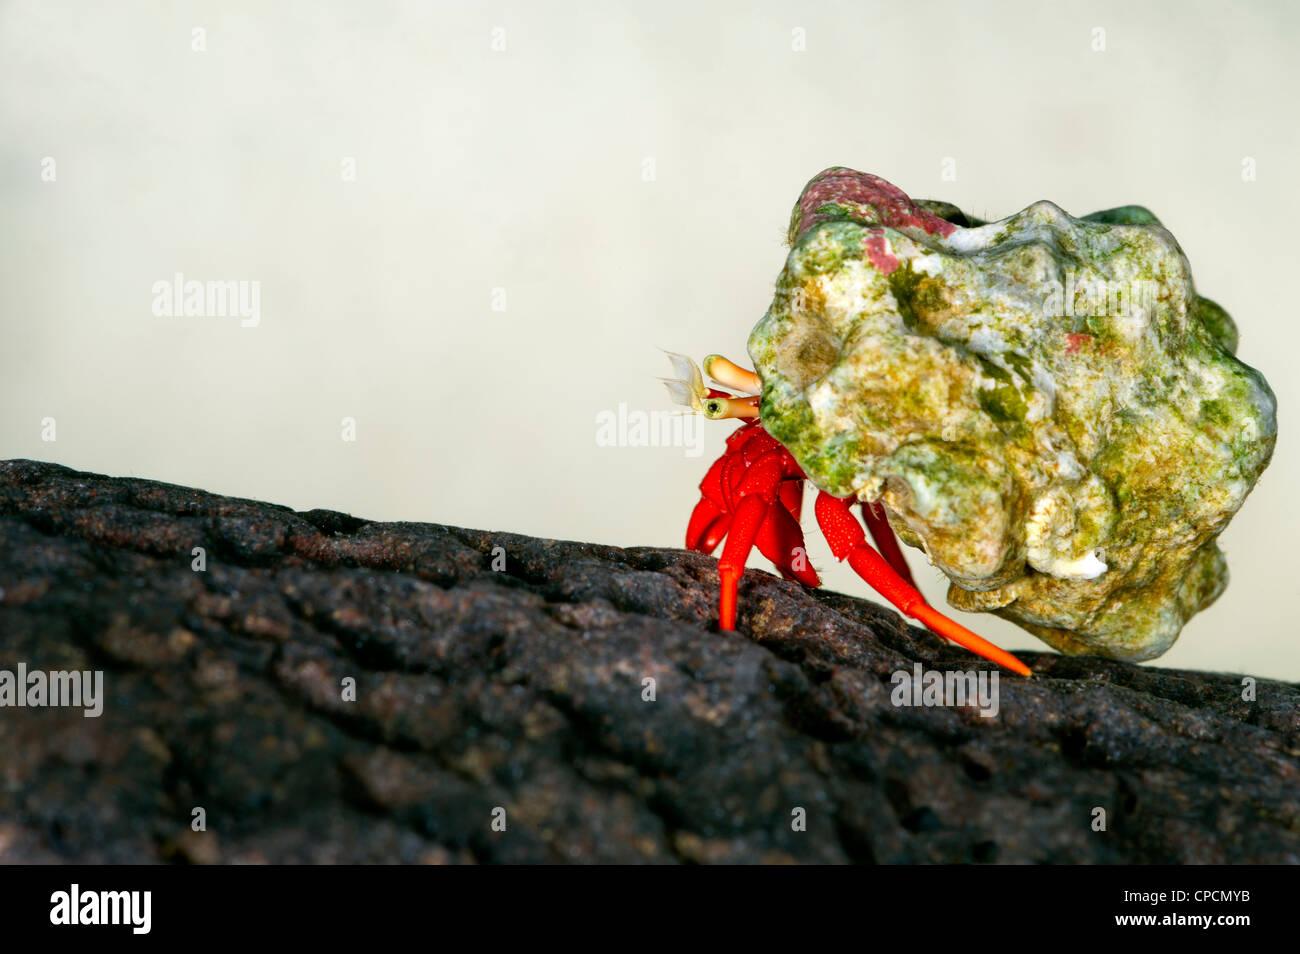 Pequeño pequeño cangrejo ermitaño CALCINUS studio retrato einsiedlerkrebs krebs fondo blanco rojo azul cangrejos pequeños de 1 cm a 2 cm makro m Foto de stock